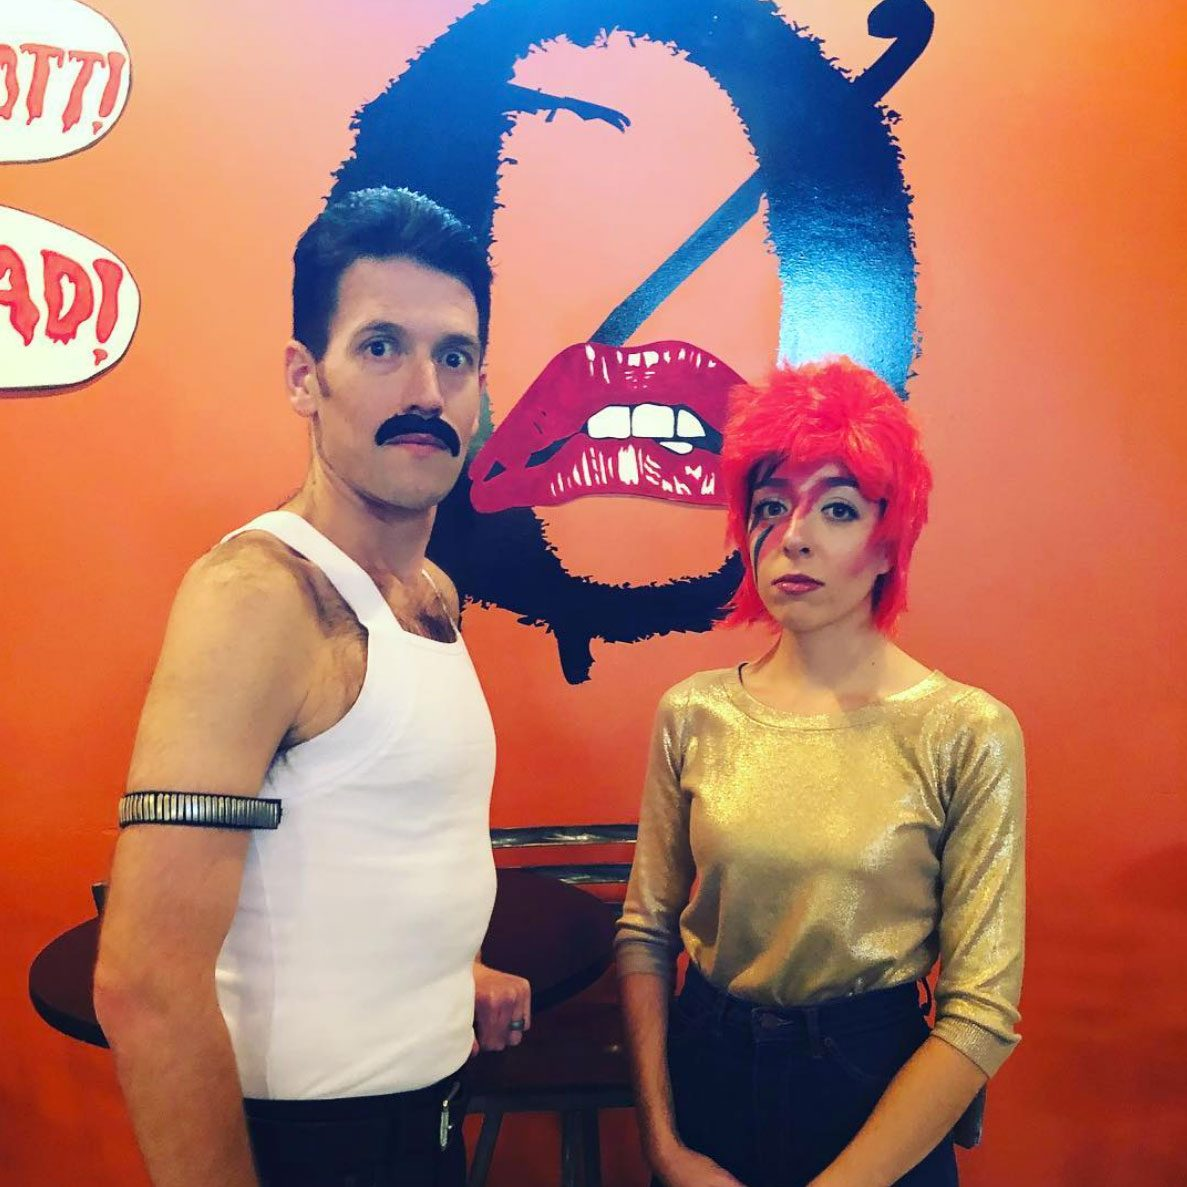 freddie mercury and david bowie couples halloween costume